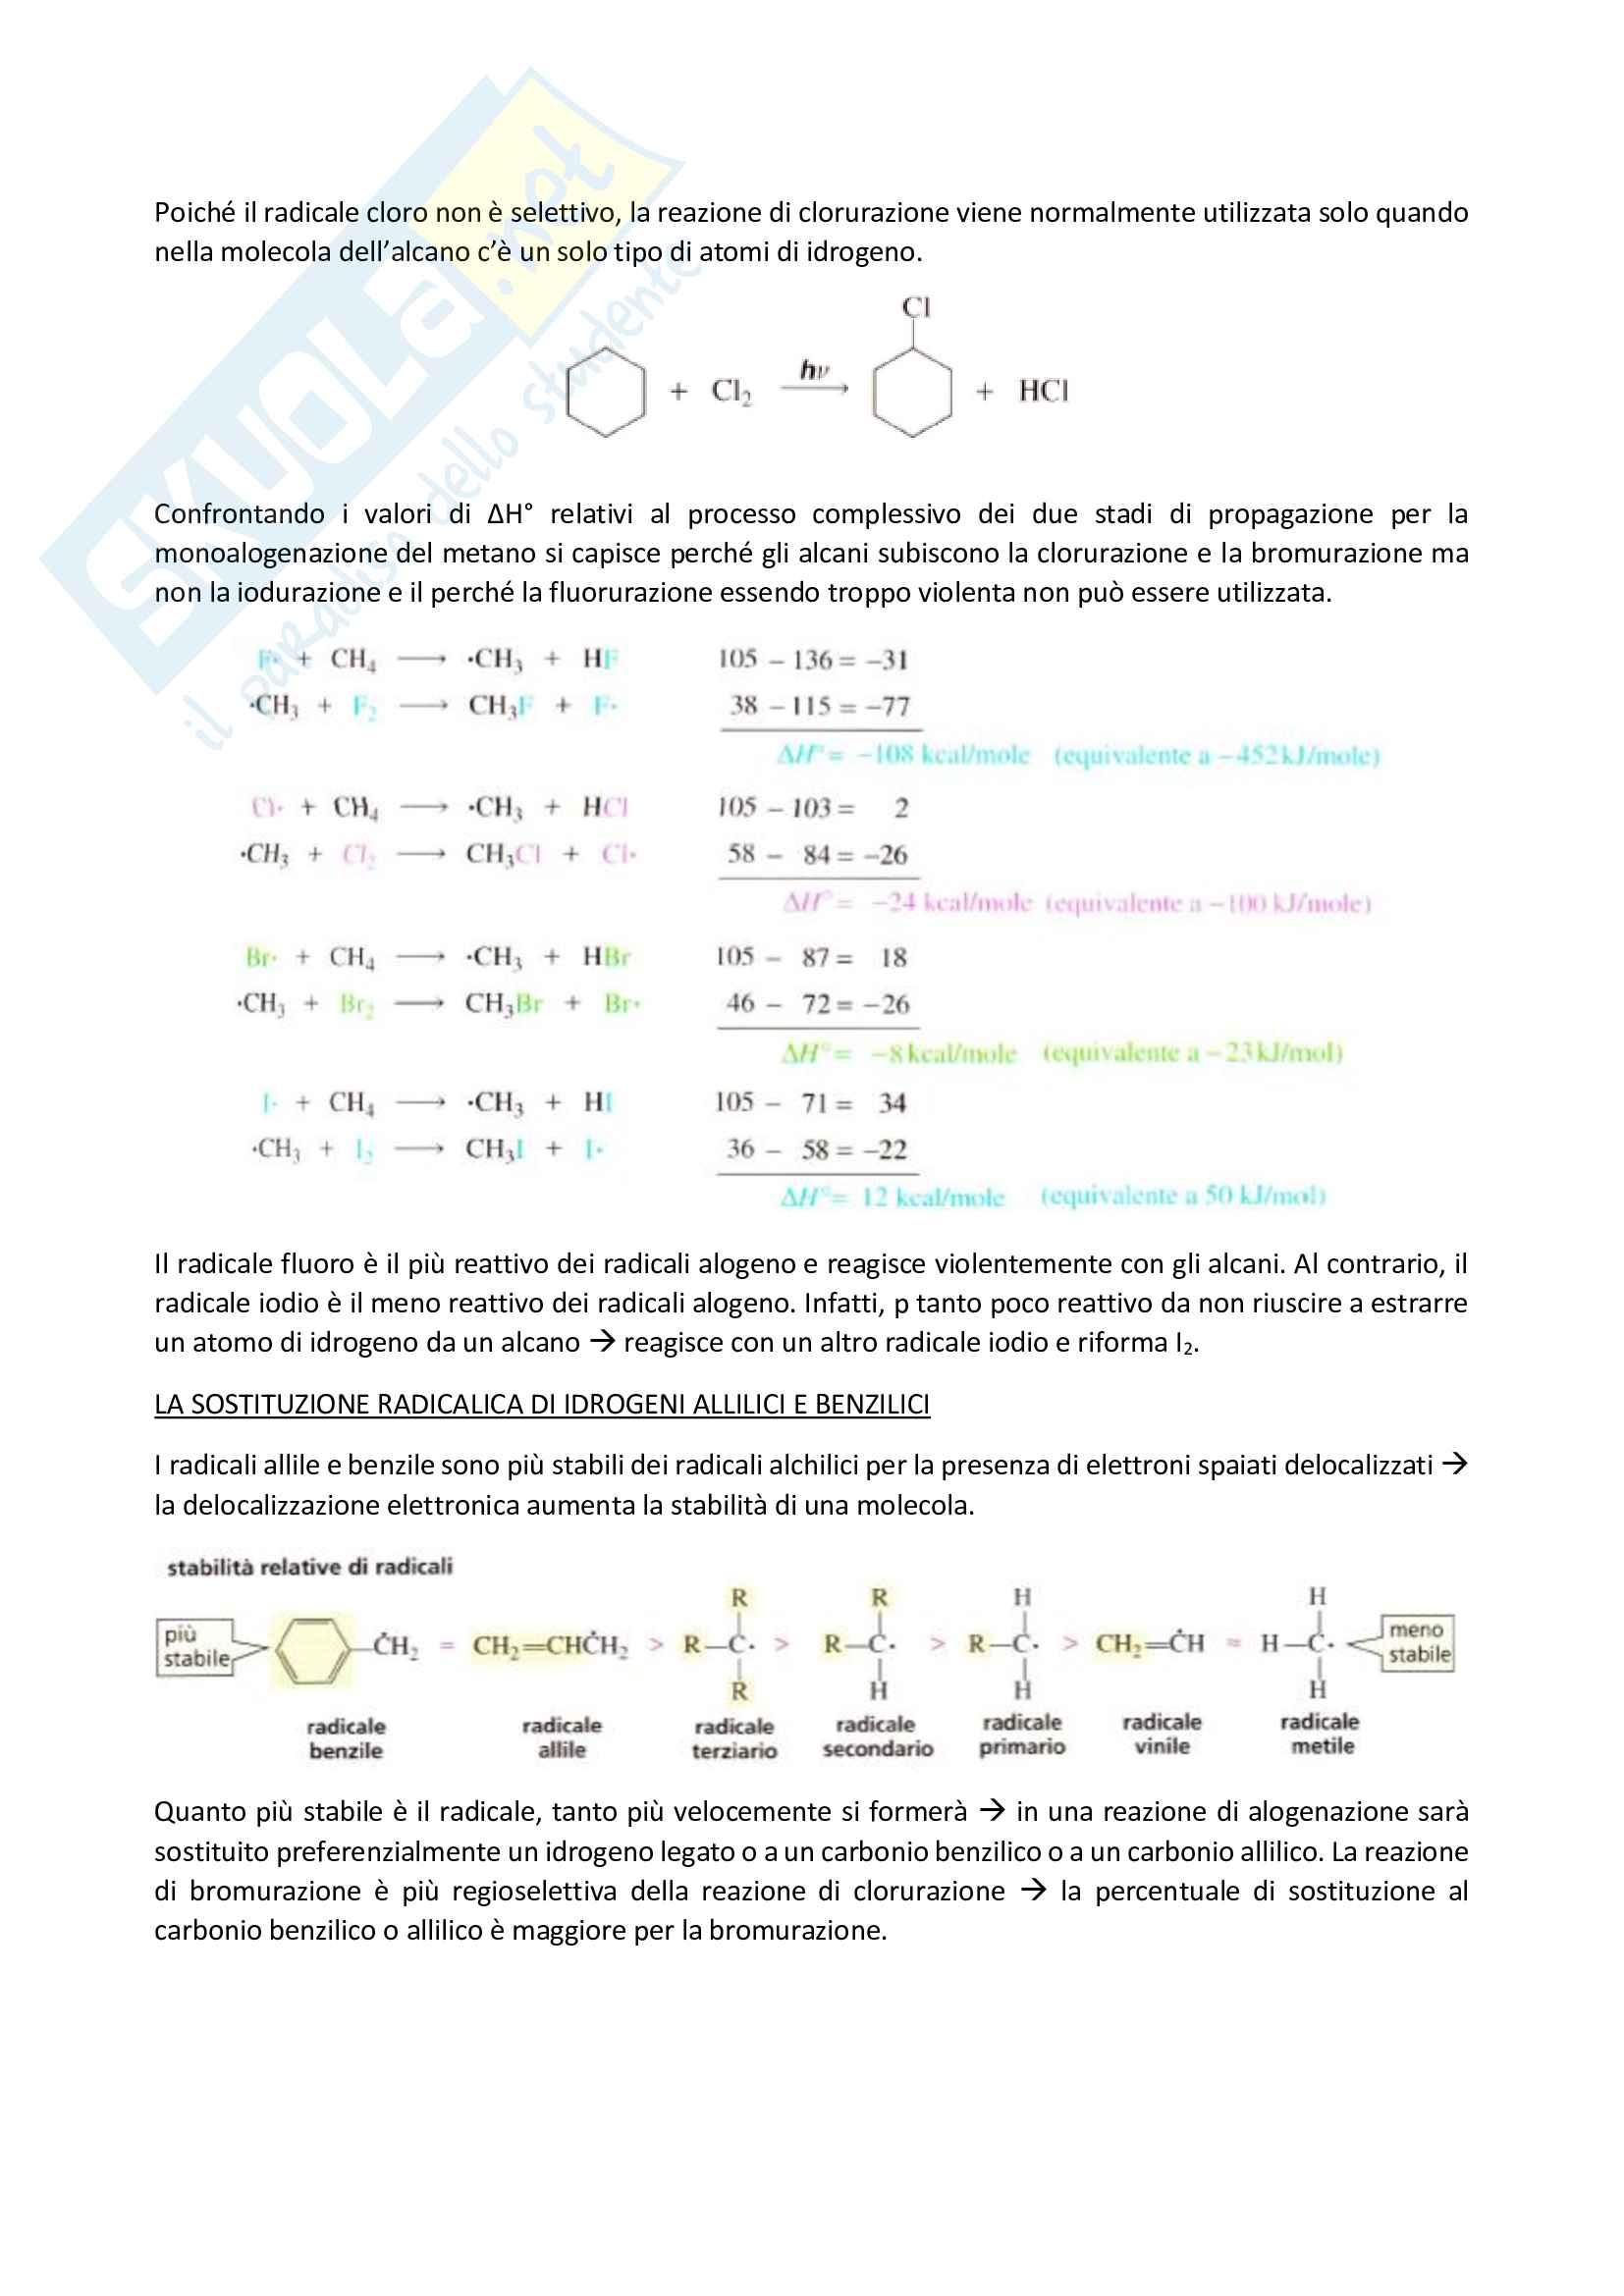 Chimica organica, Reazioni degli alcani - I radicali Pag. 6